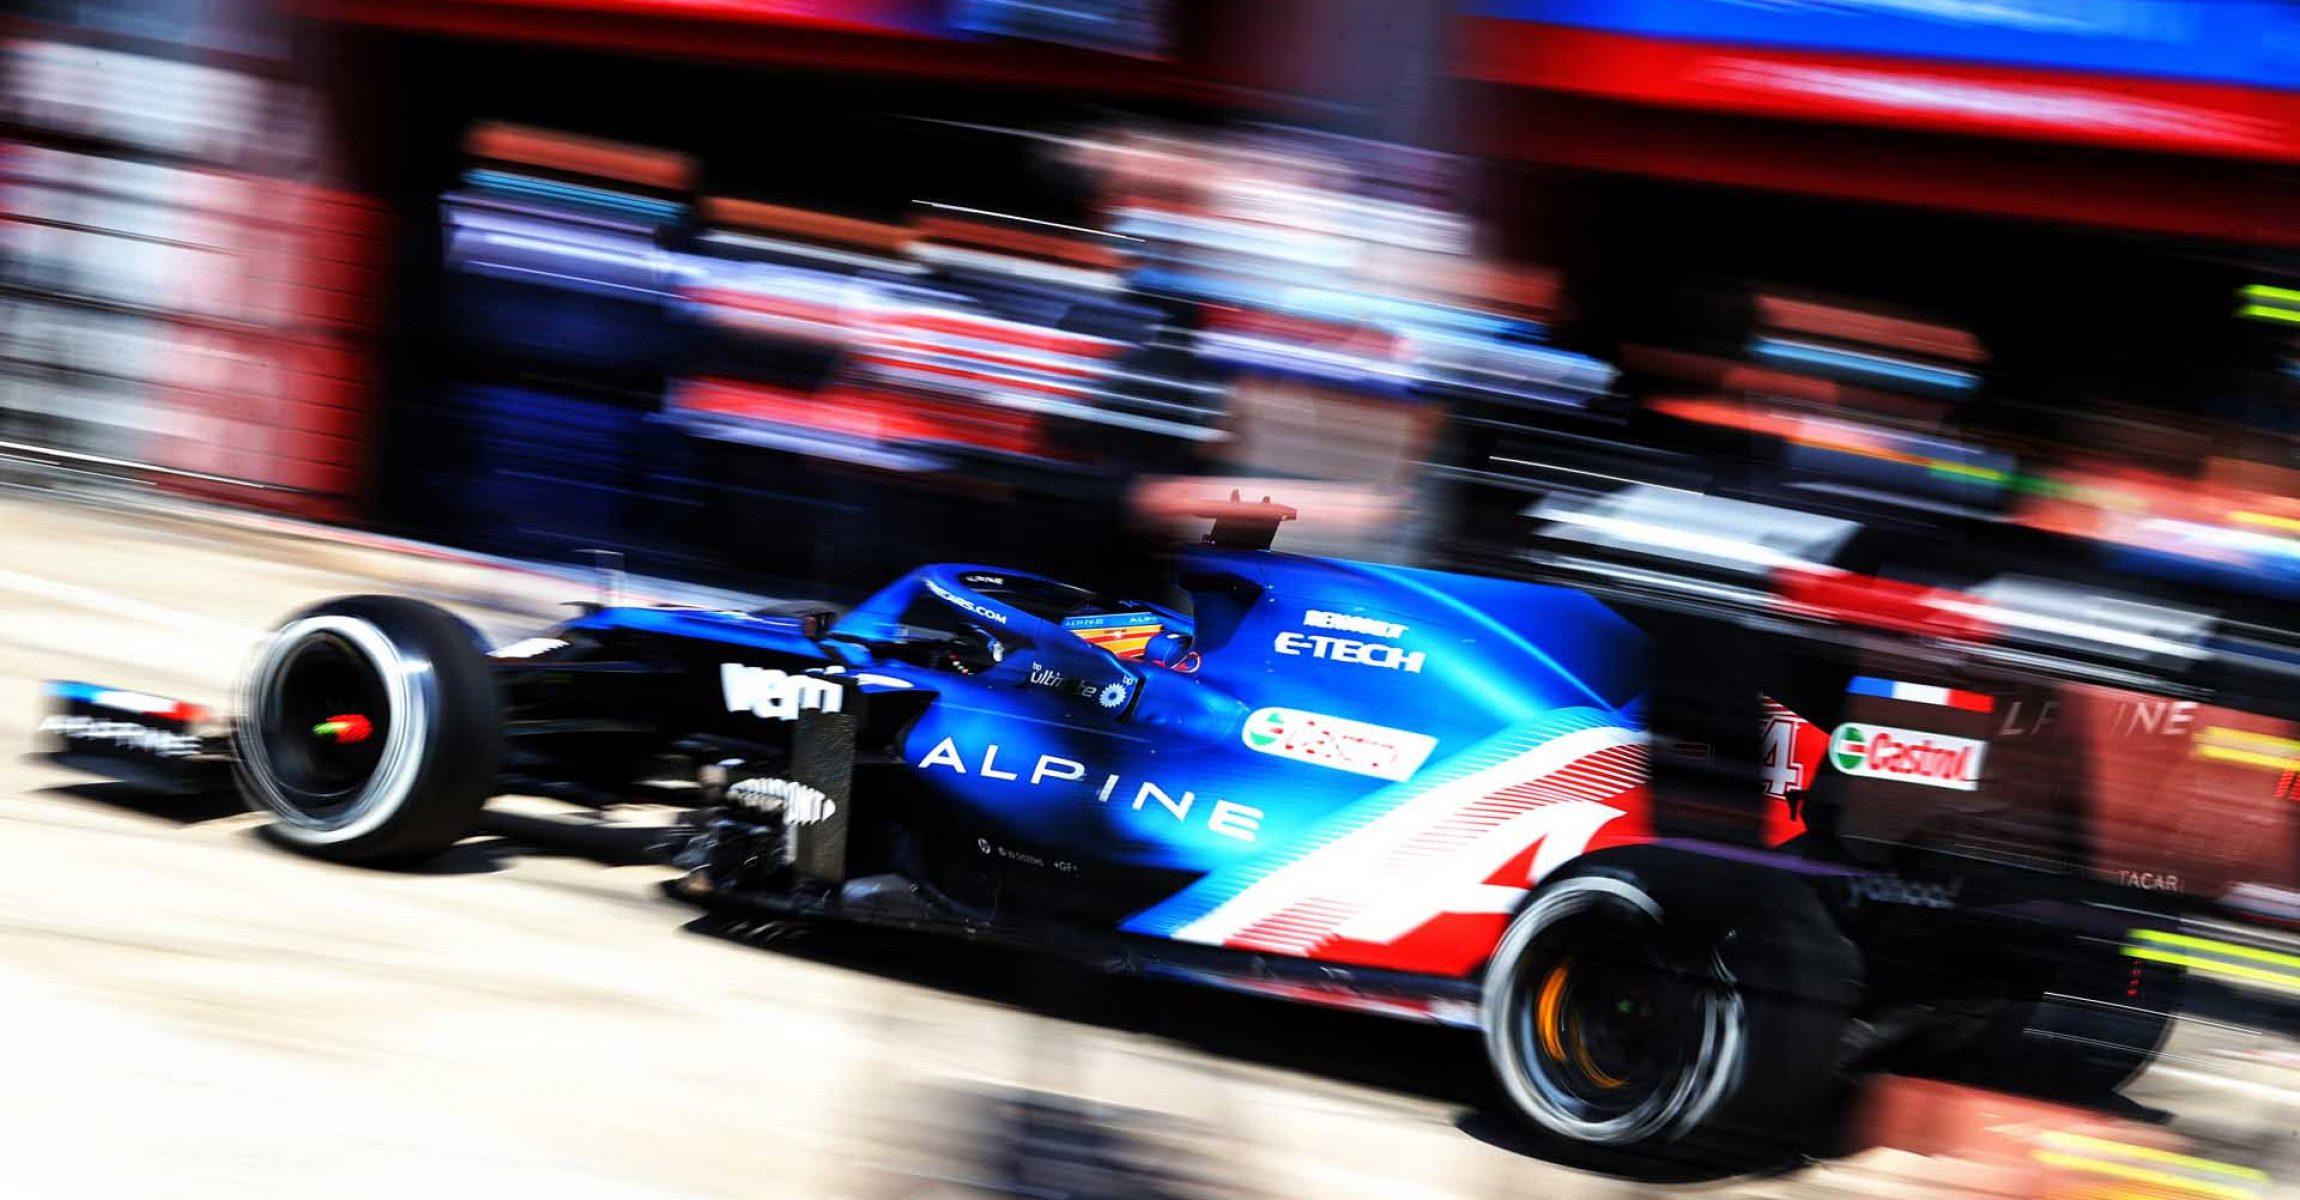 Fernando Alonso (ESP) Alpine F1 Team A521 leaves the pits. Emilia Romagna Grand Prix, Friday 16th April 2021. Imola, Italy.